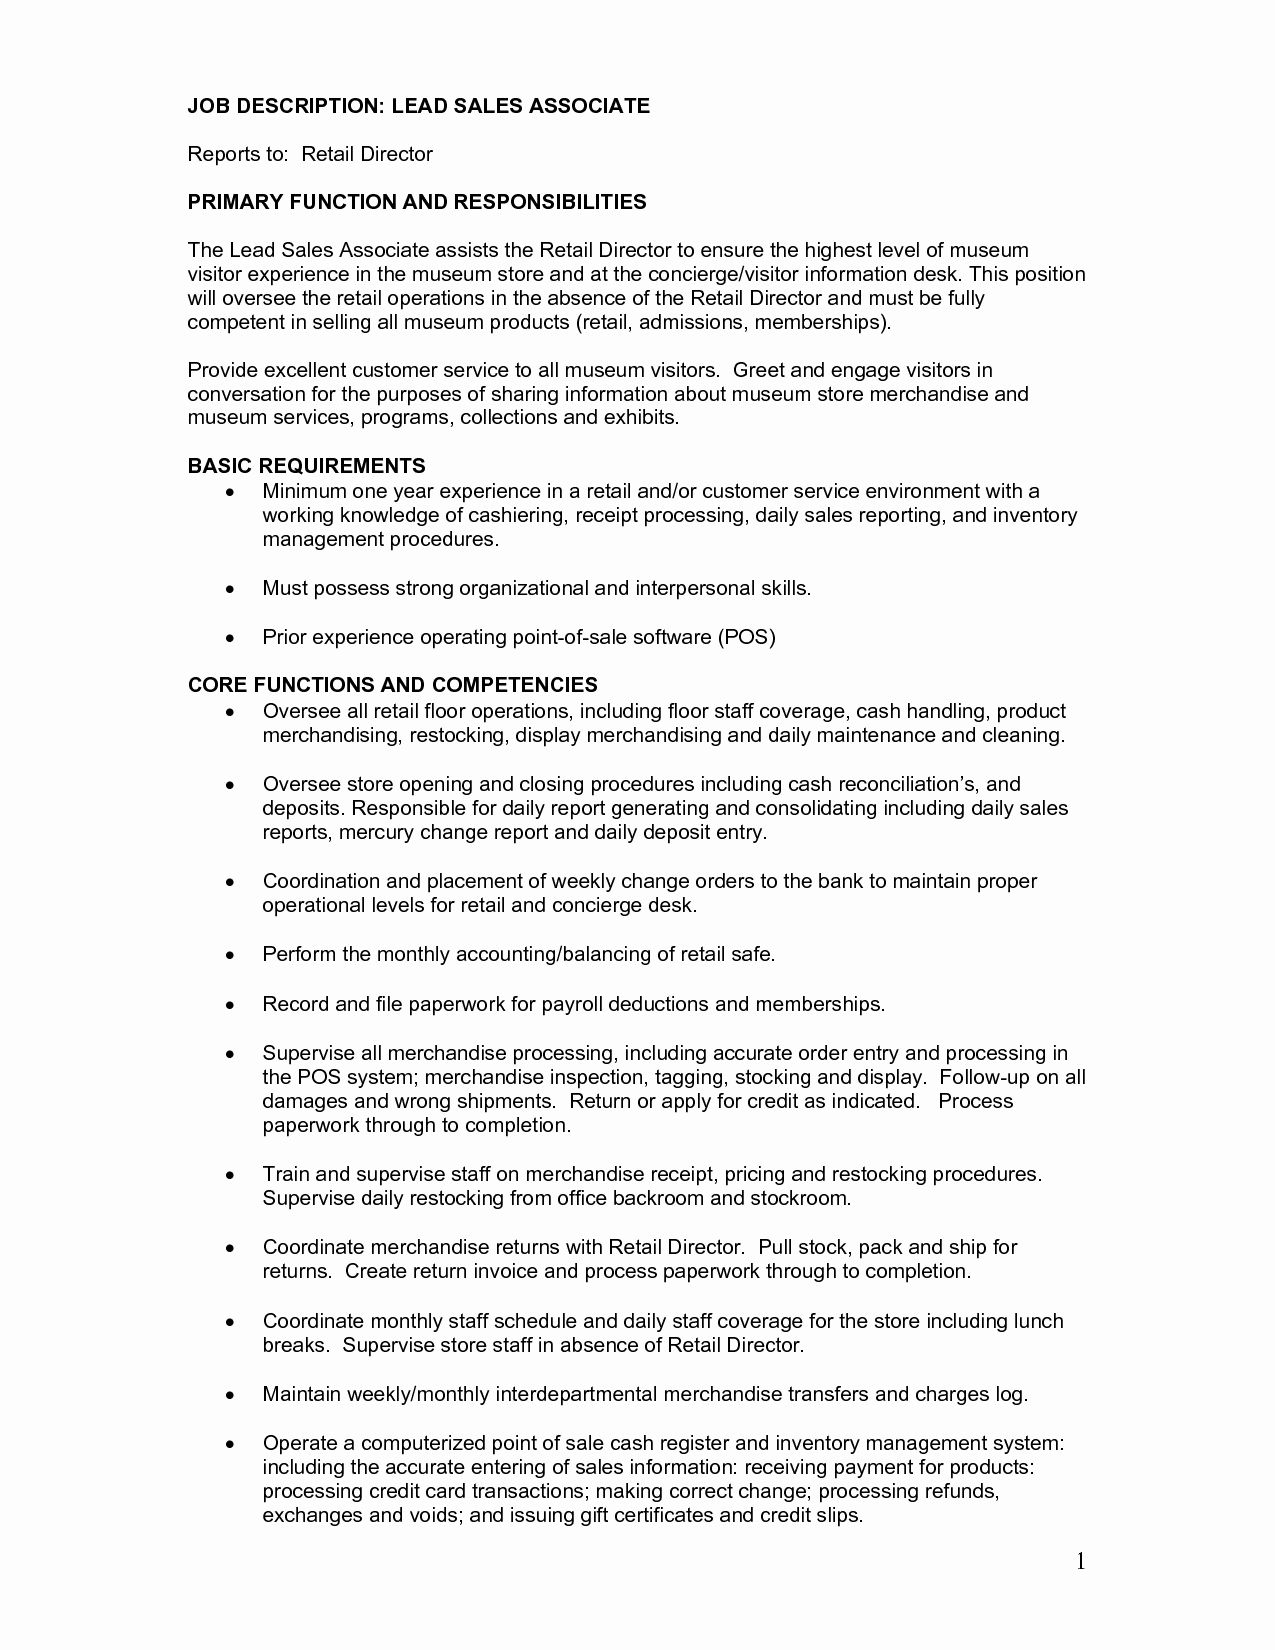 Job Description Definition Resume